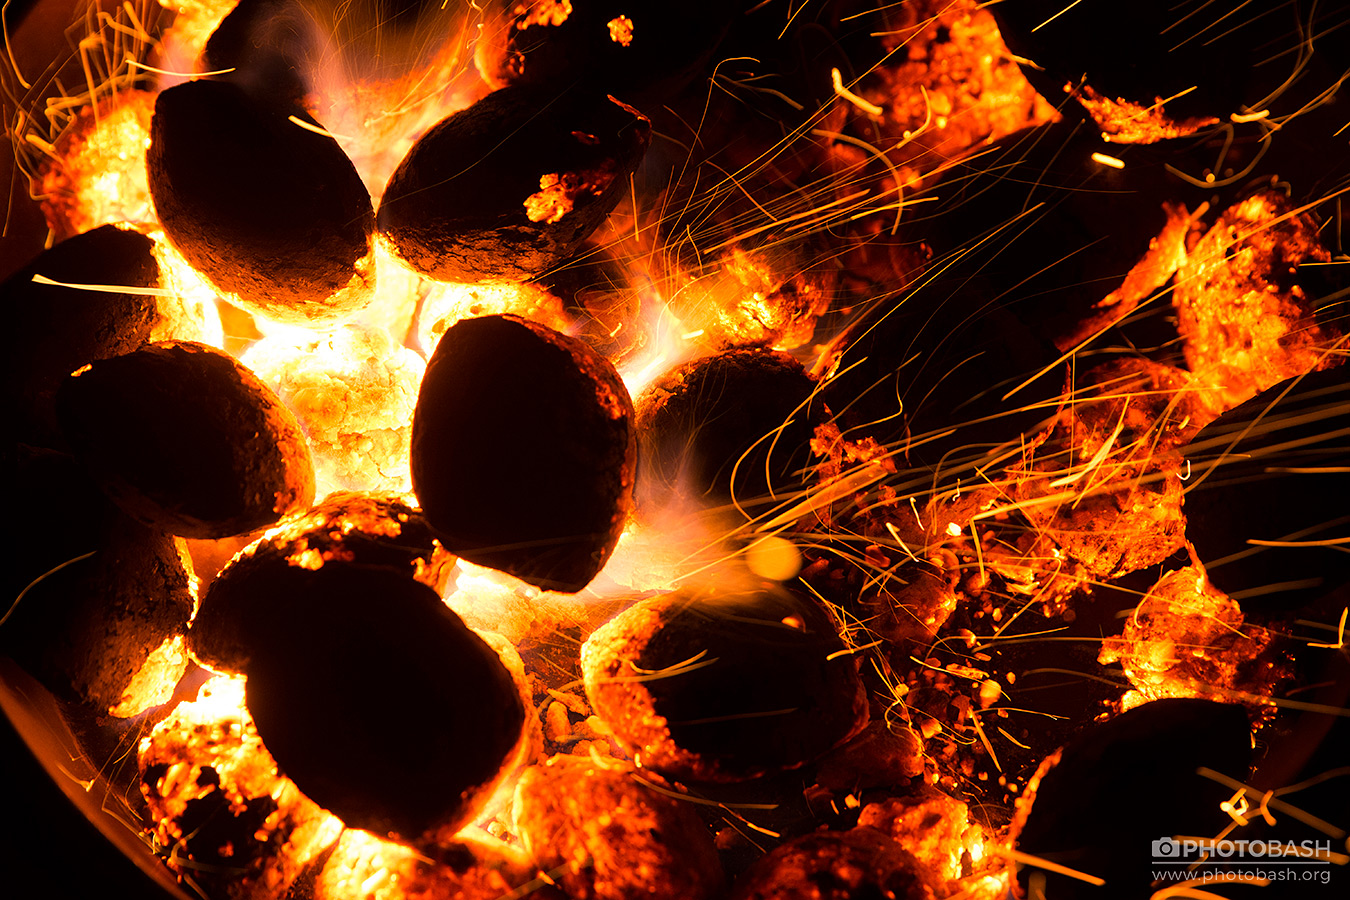 Fire-Flames-Glowing-Lava-Coals.jpg